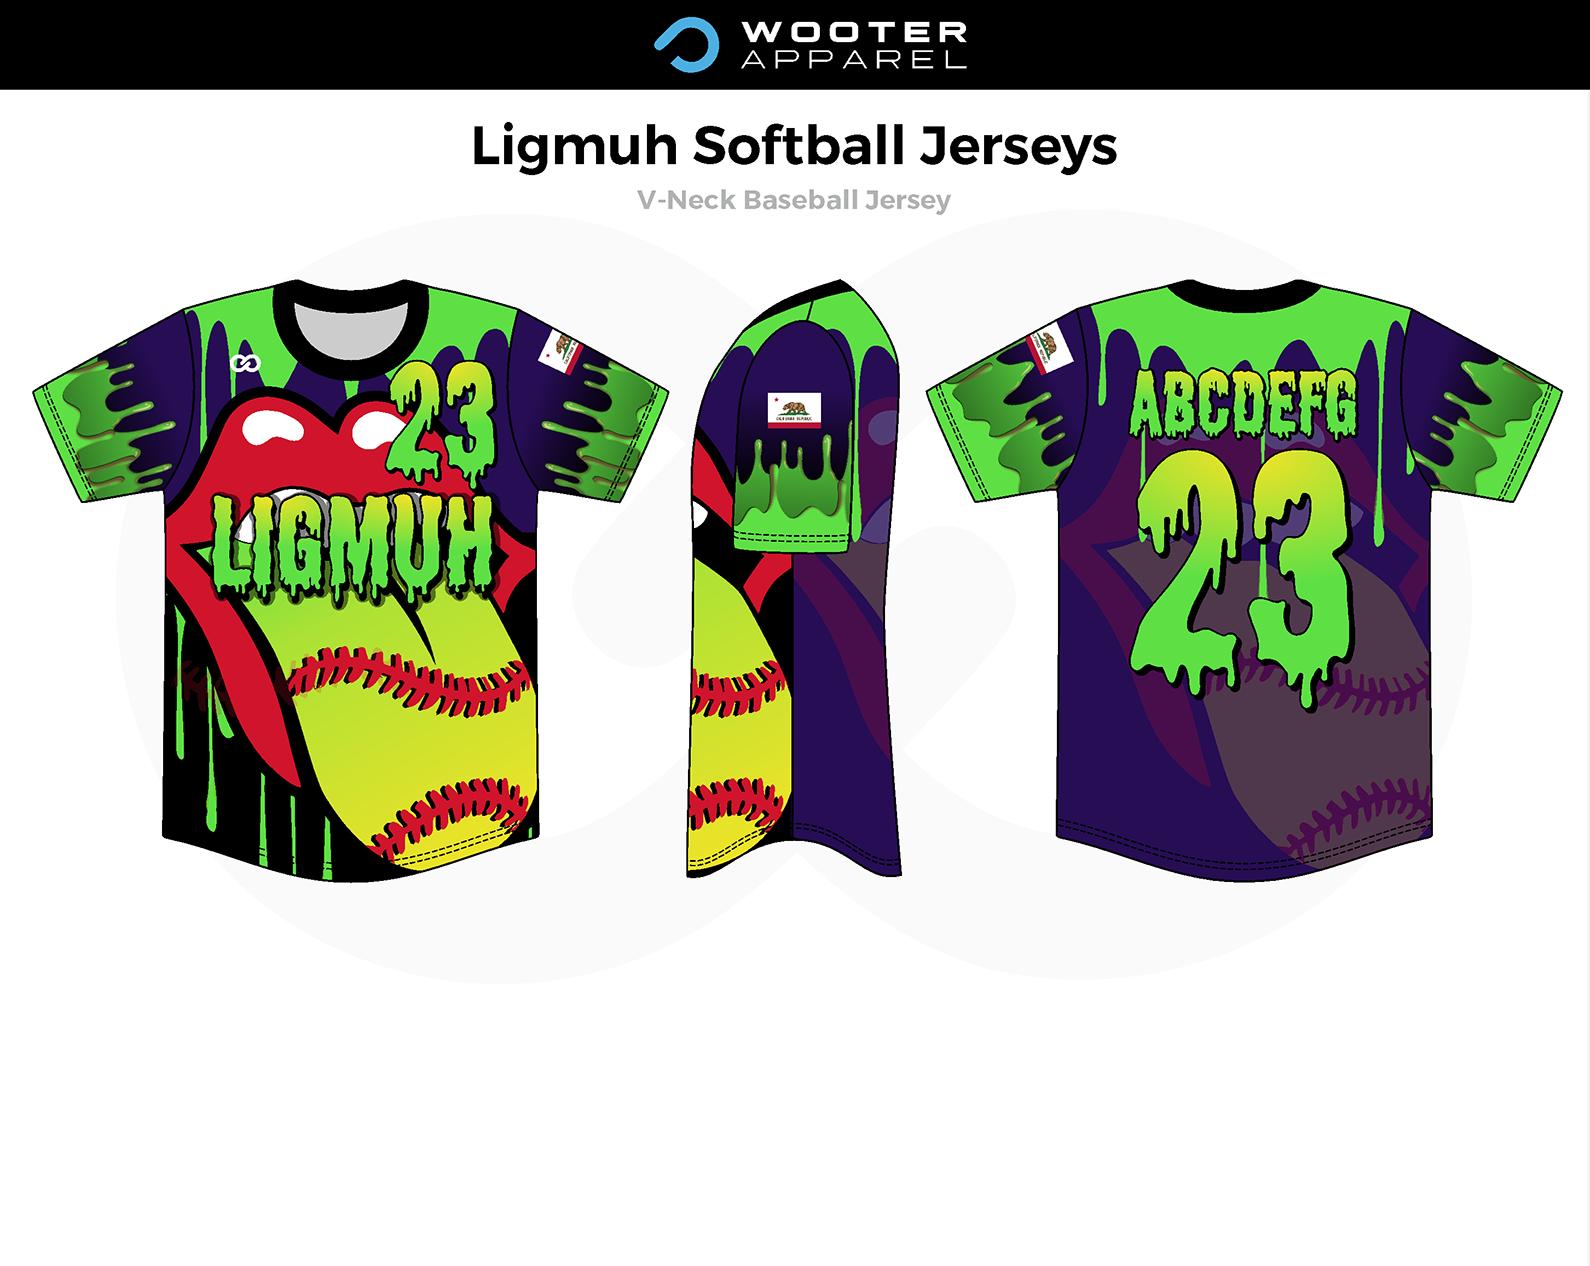 2018-10-04 Ligmuh Softball Jerseys.png